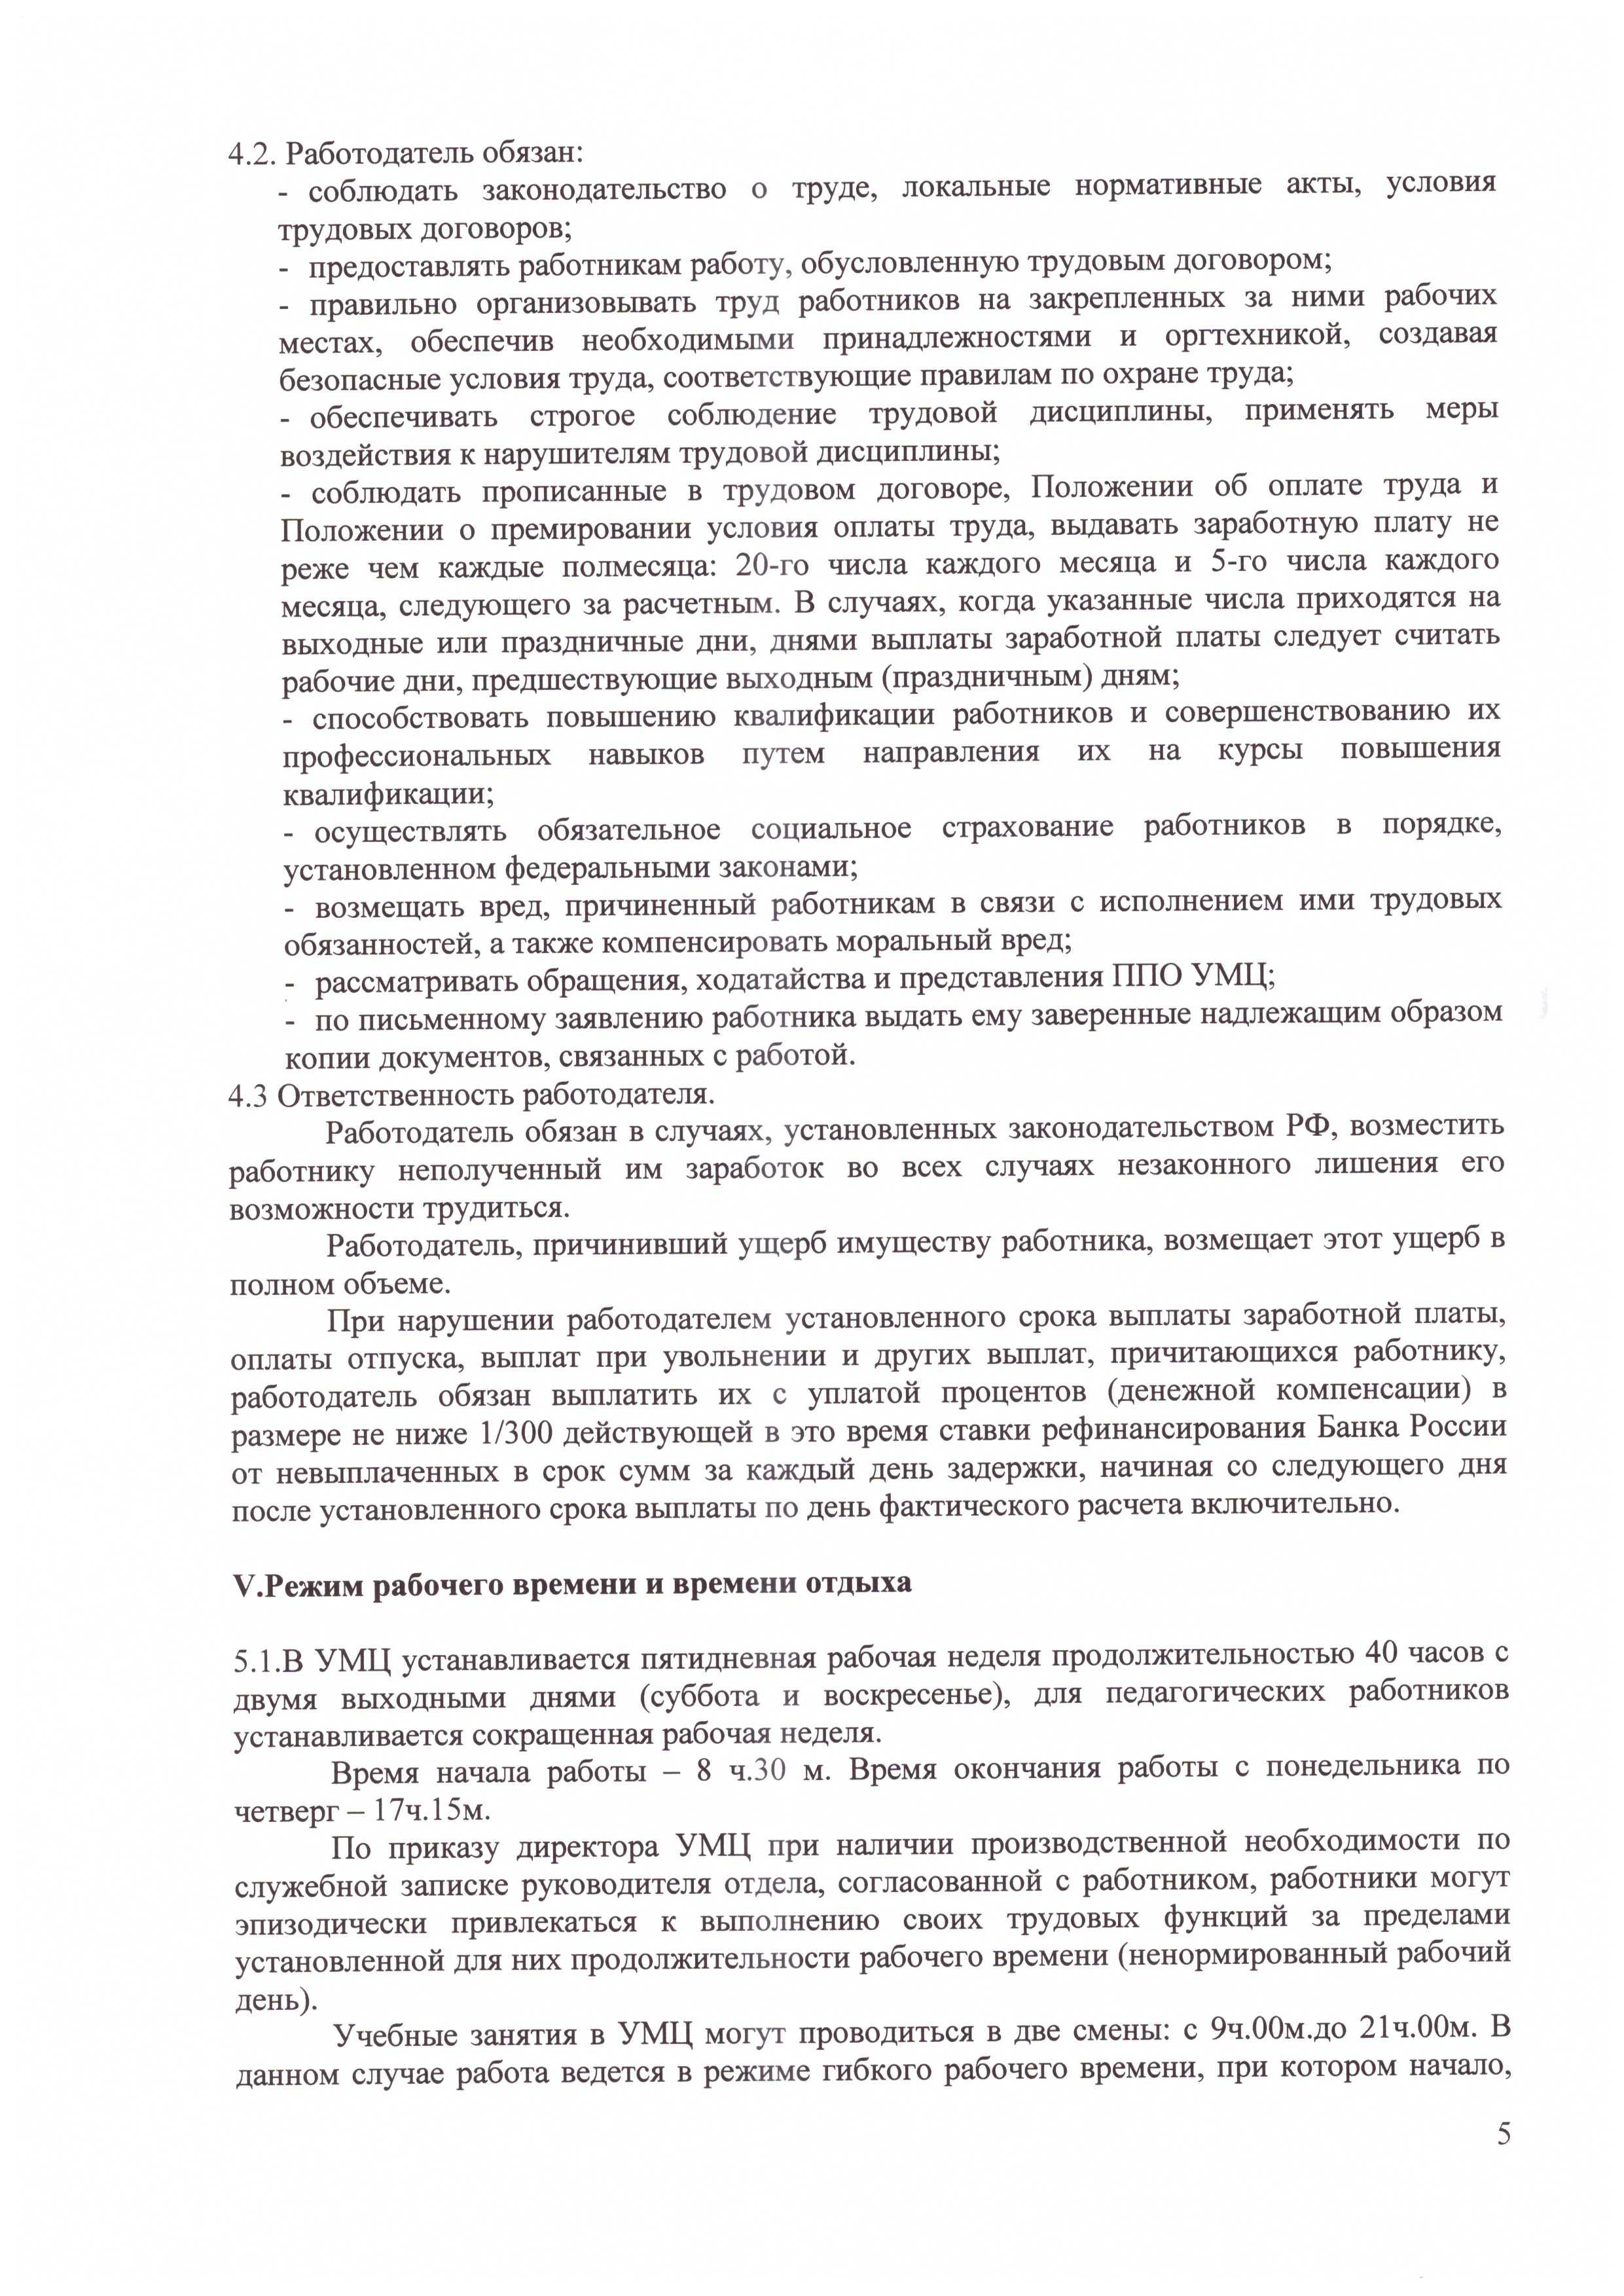 SCAN_правила внутр.распор_Страница_5